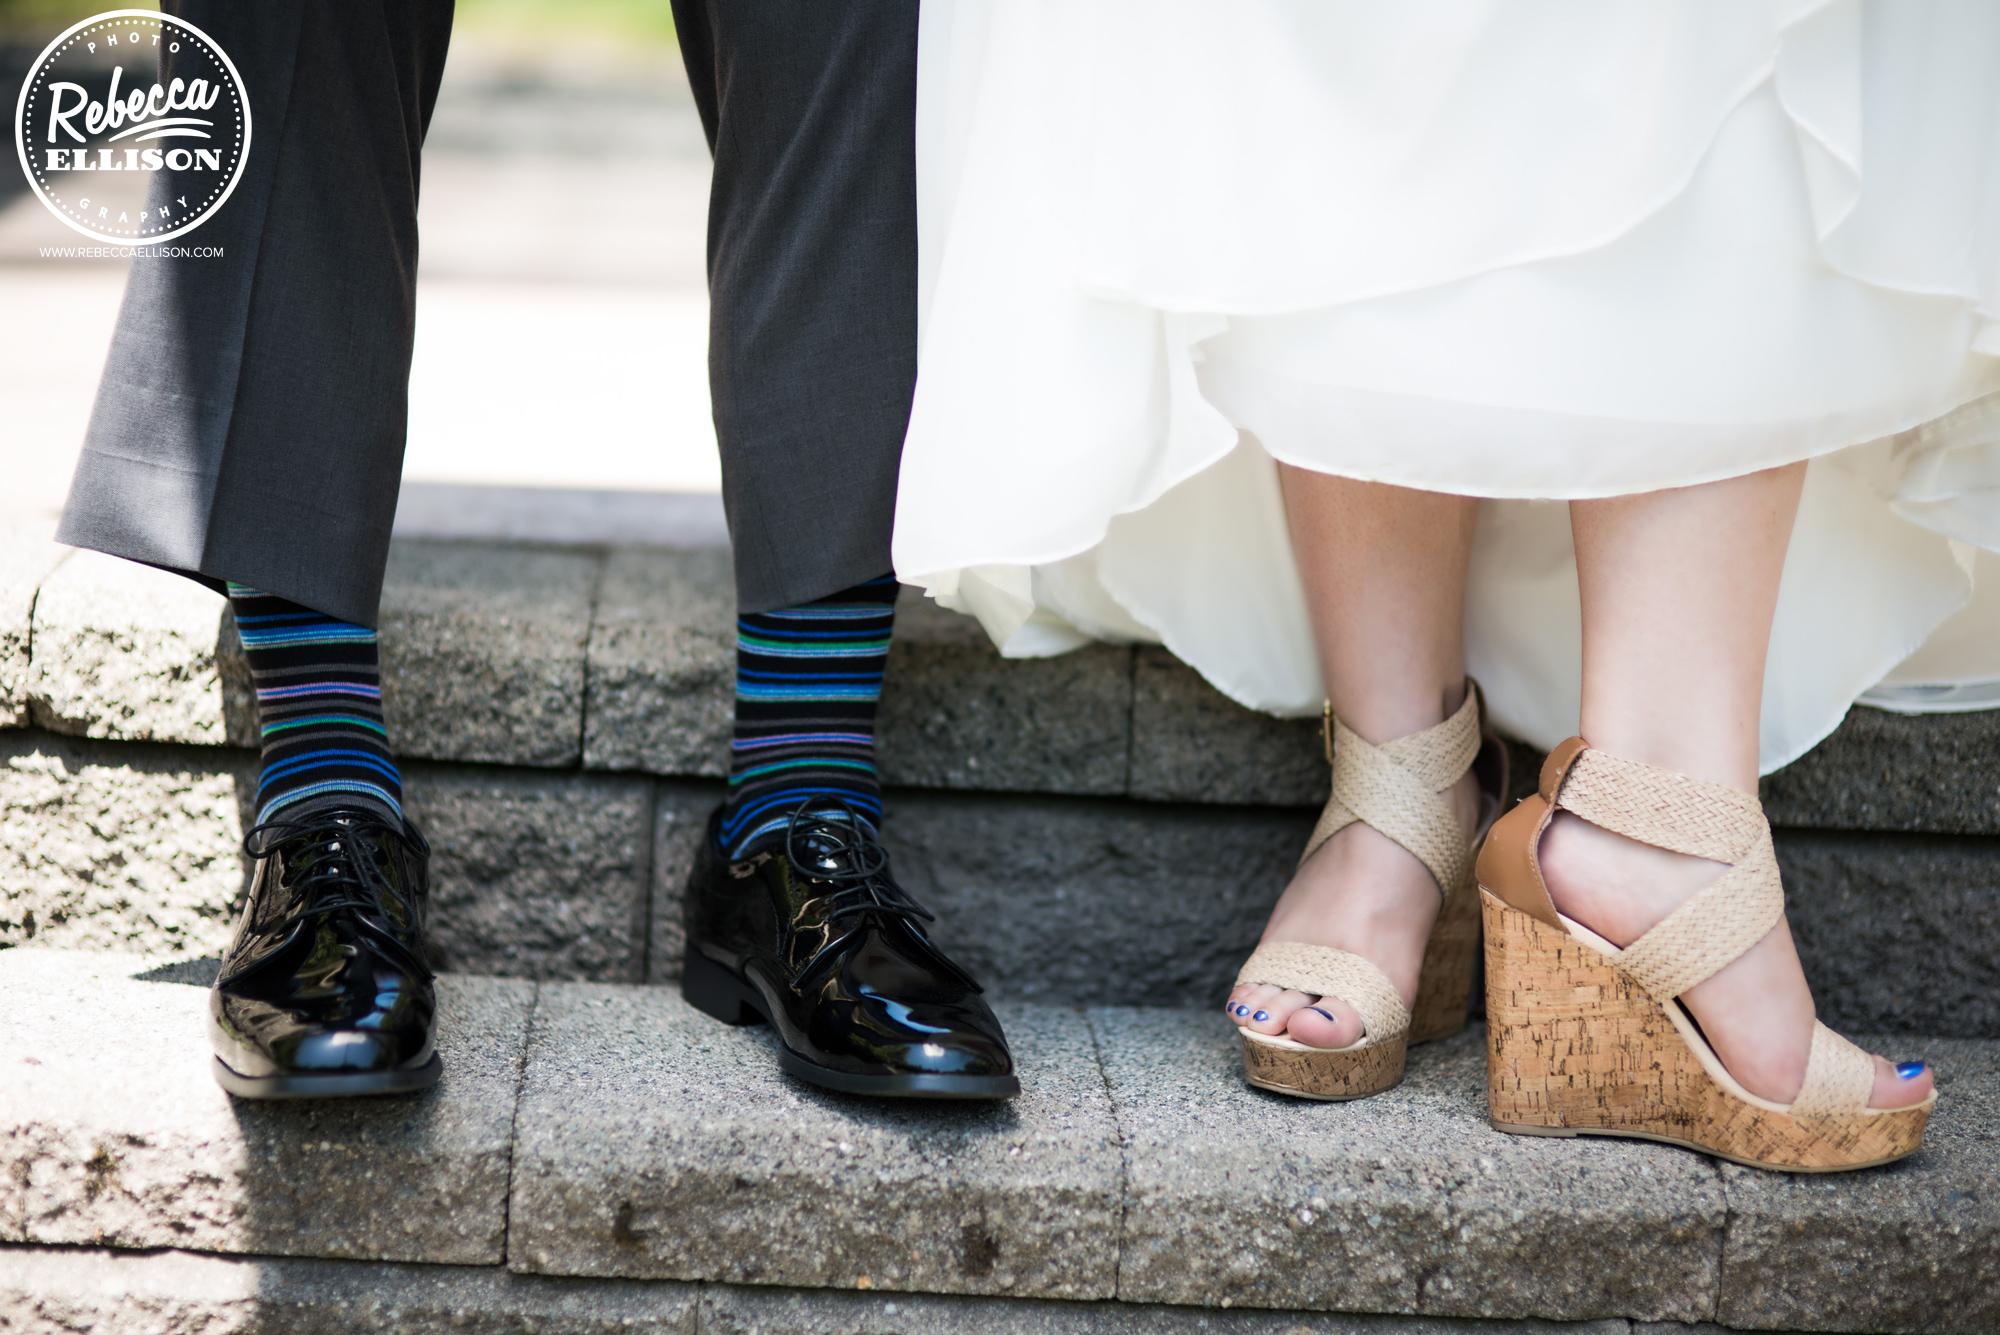 Wedding portraits featuring feet wearing tan cork wedge sandals and striped socks